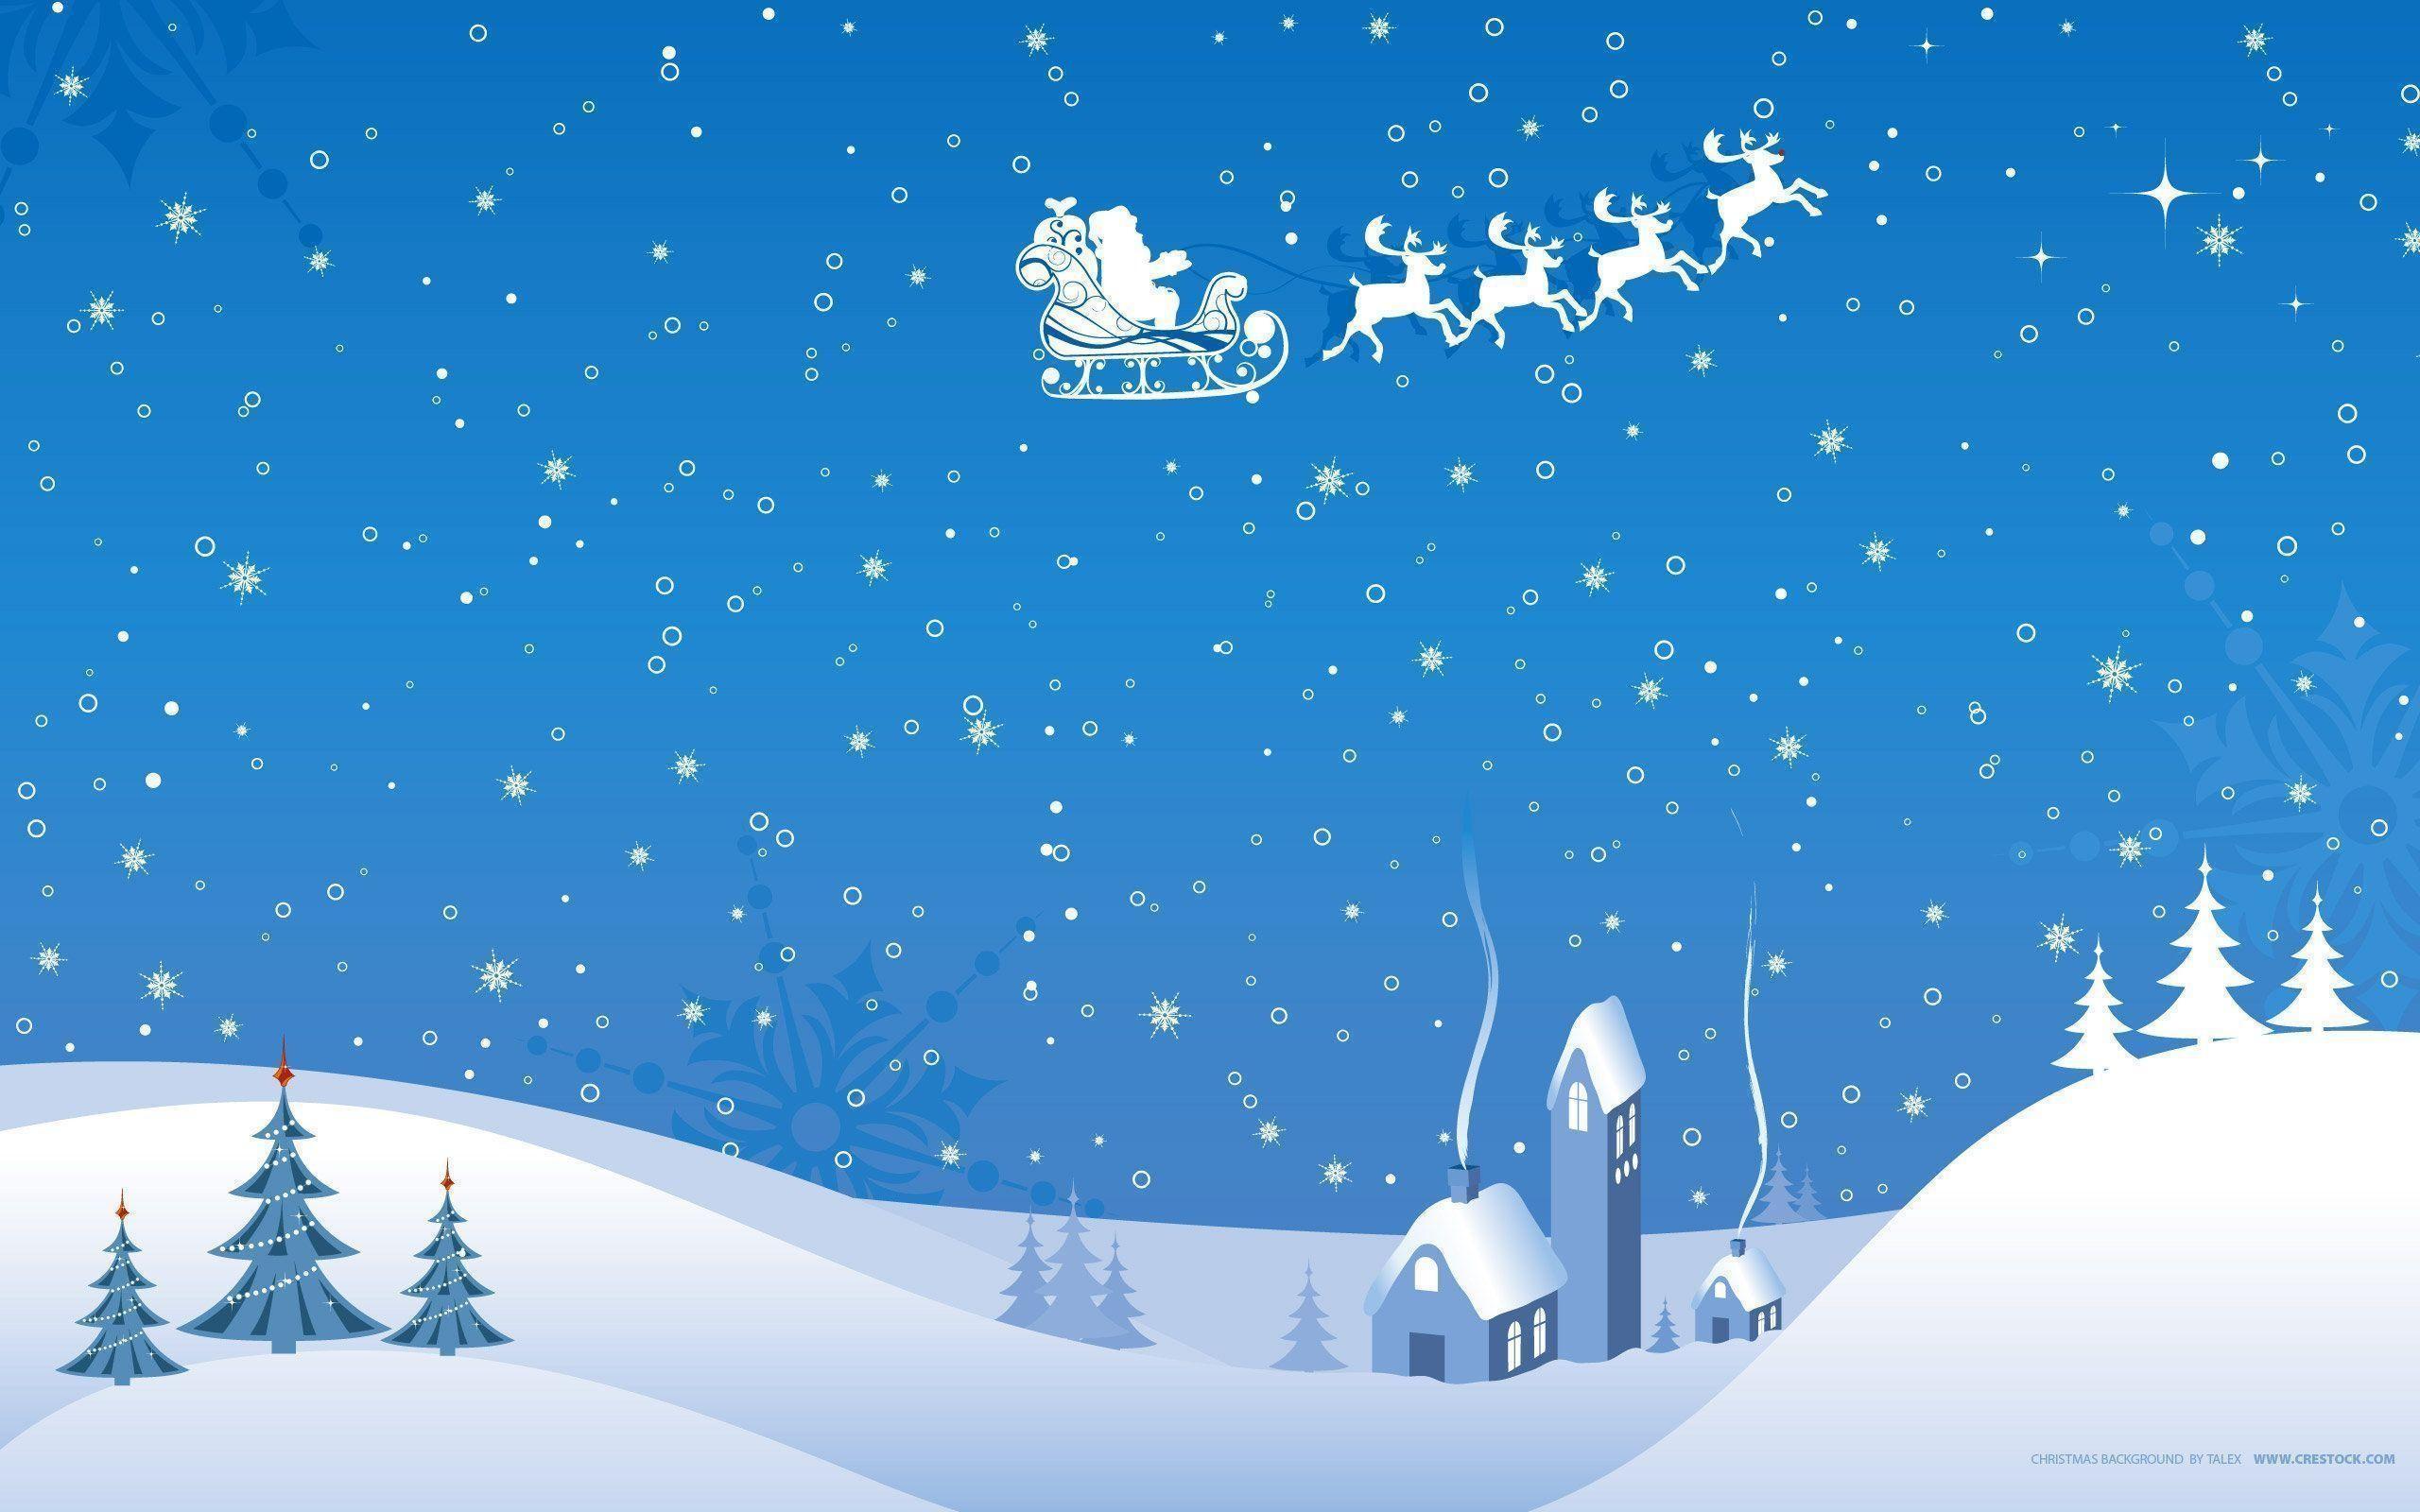 Christmas snow scene wallpaper | | 1208 | WallpaperUP